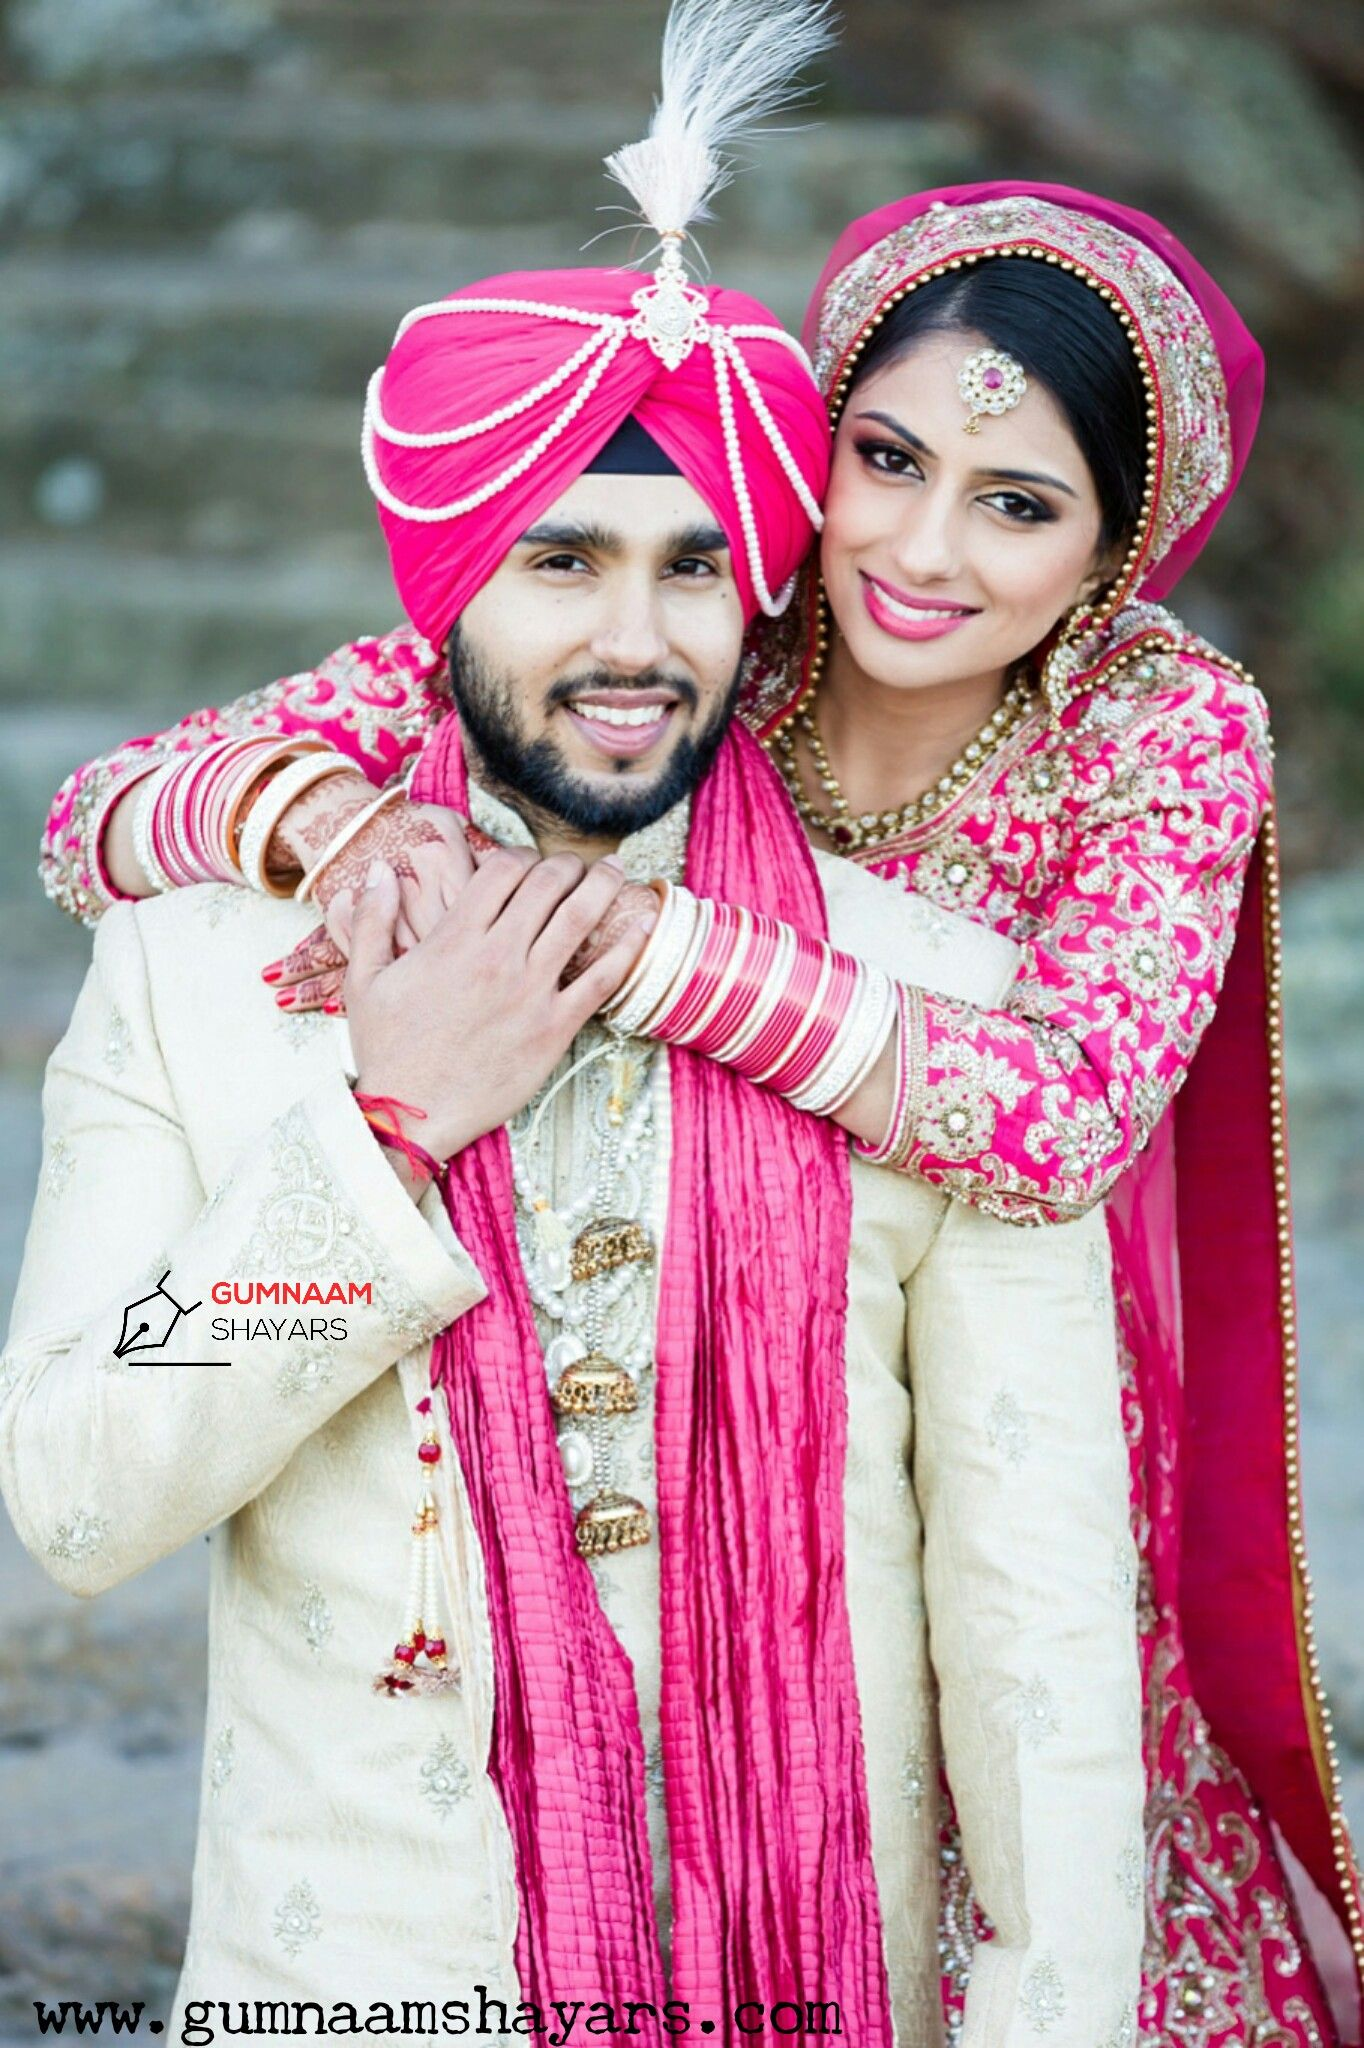 Pin de Gumnaam Shayars en Punjabi Couple   Pinterest